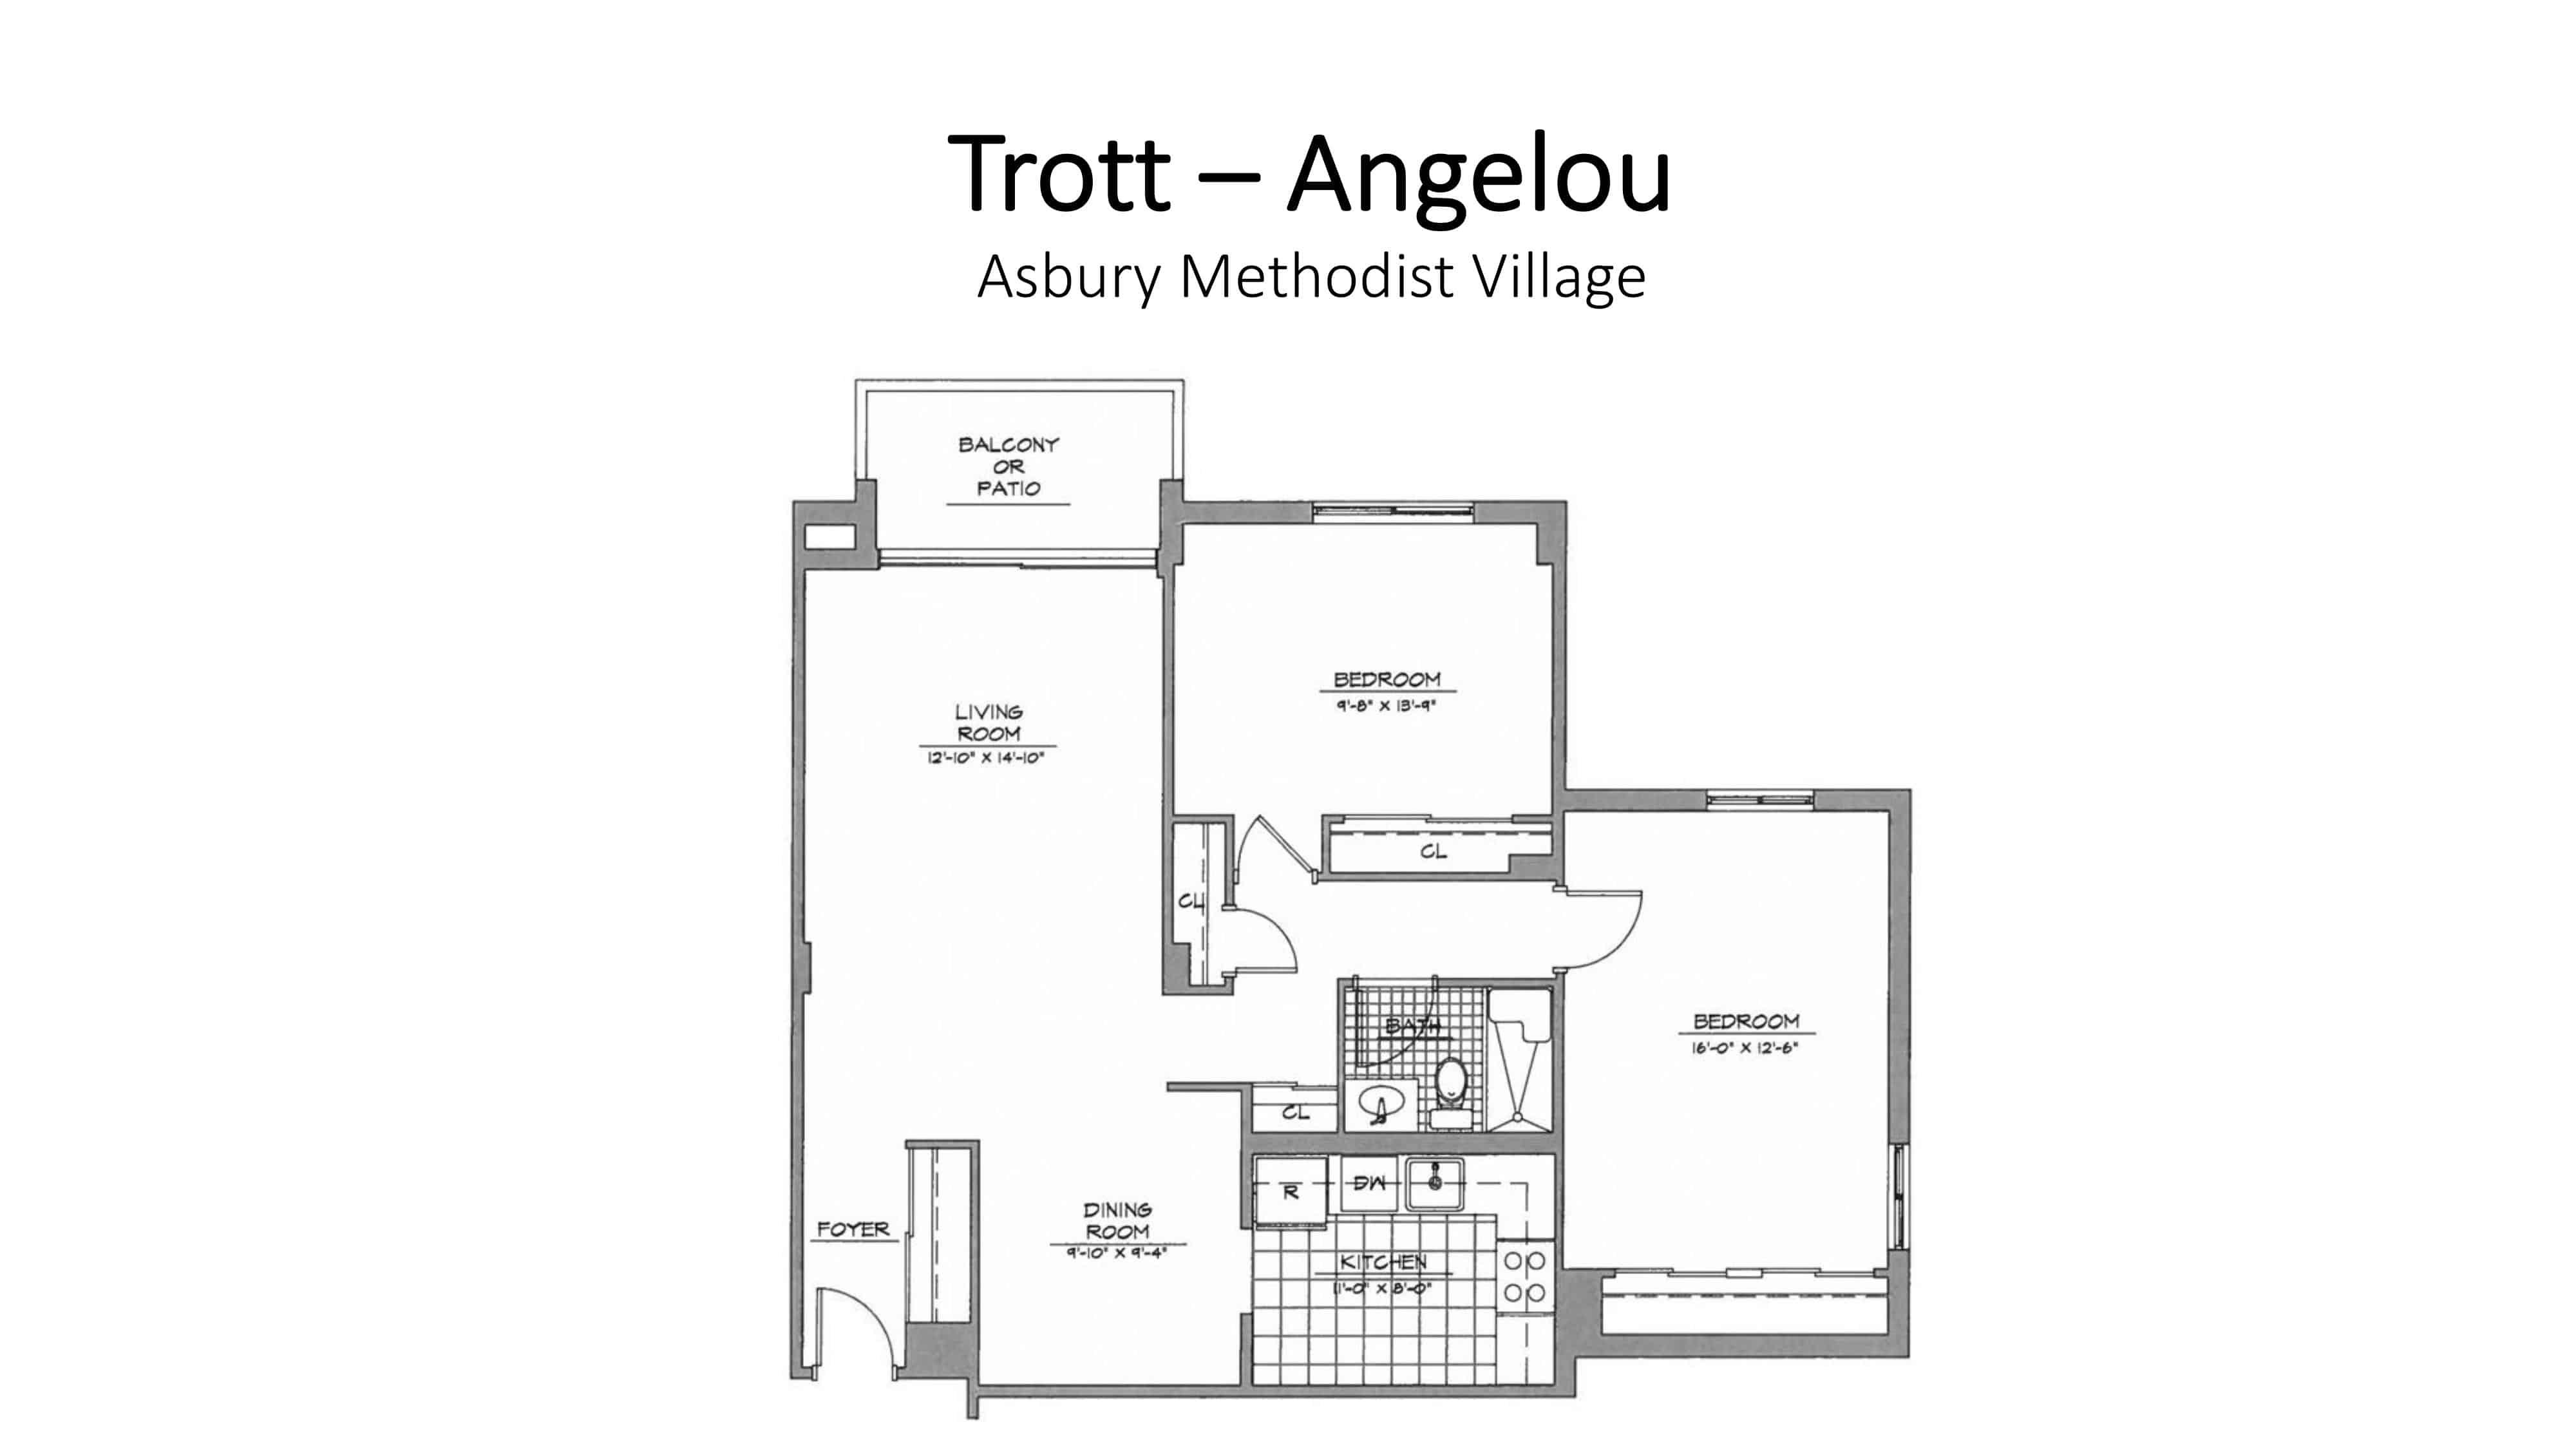 AMV Trott Angelou